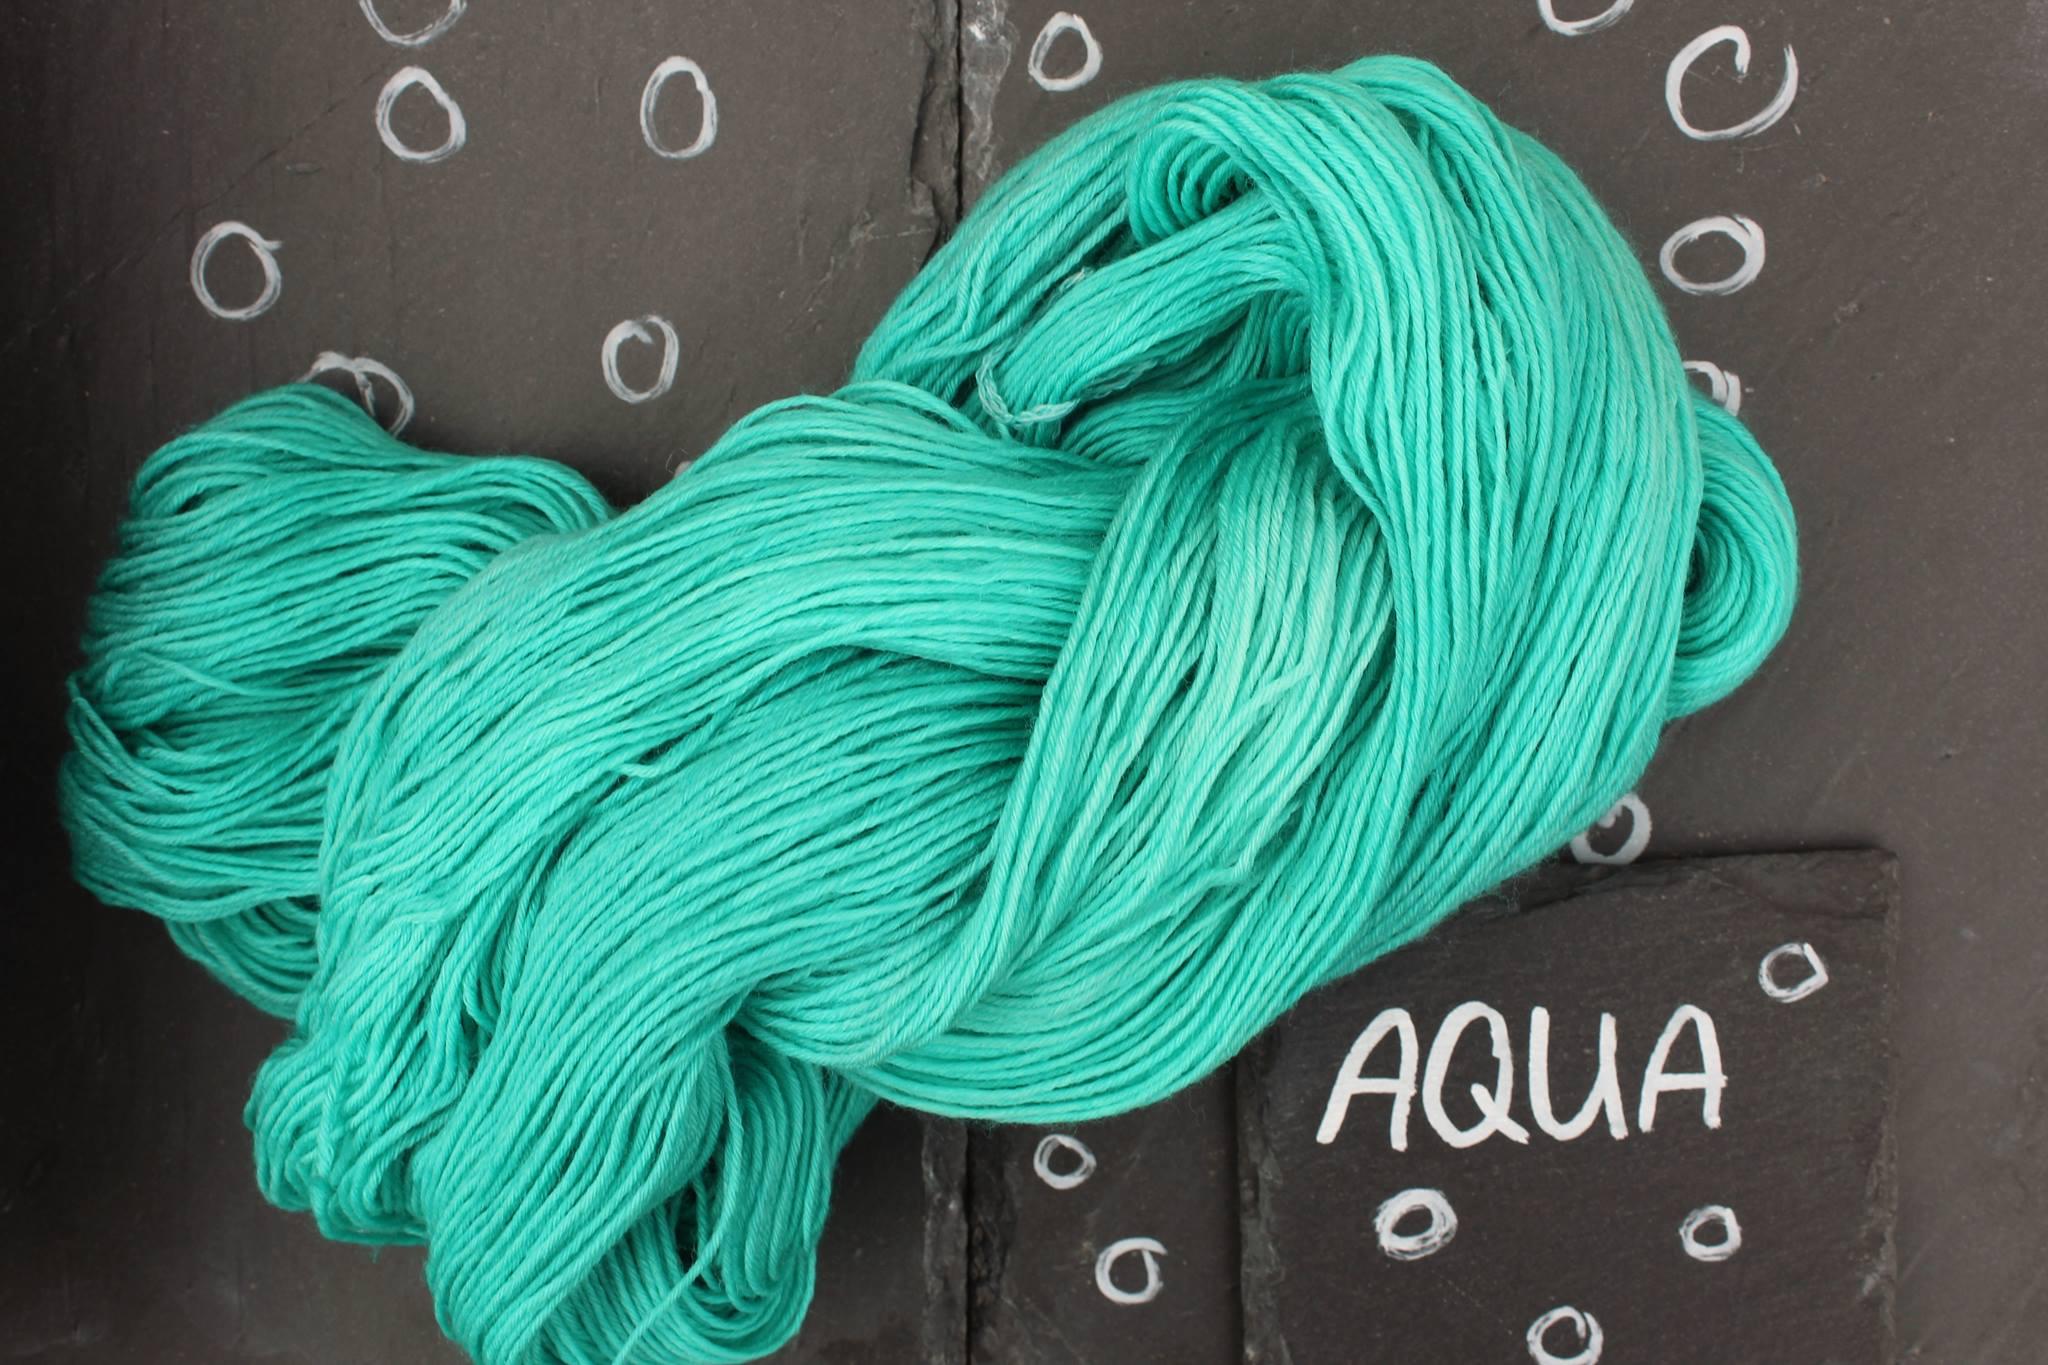 Aqua Pure Merino